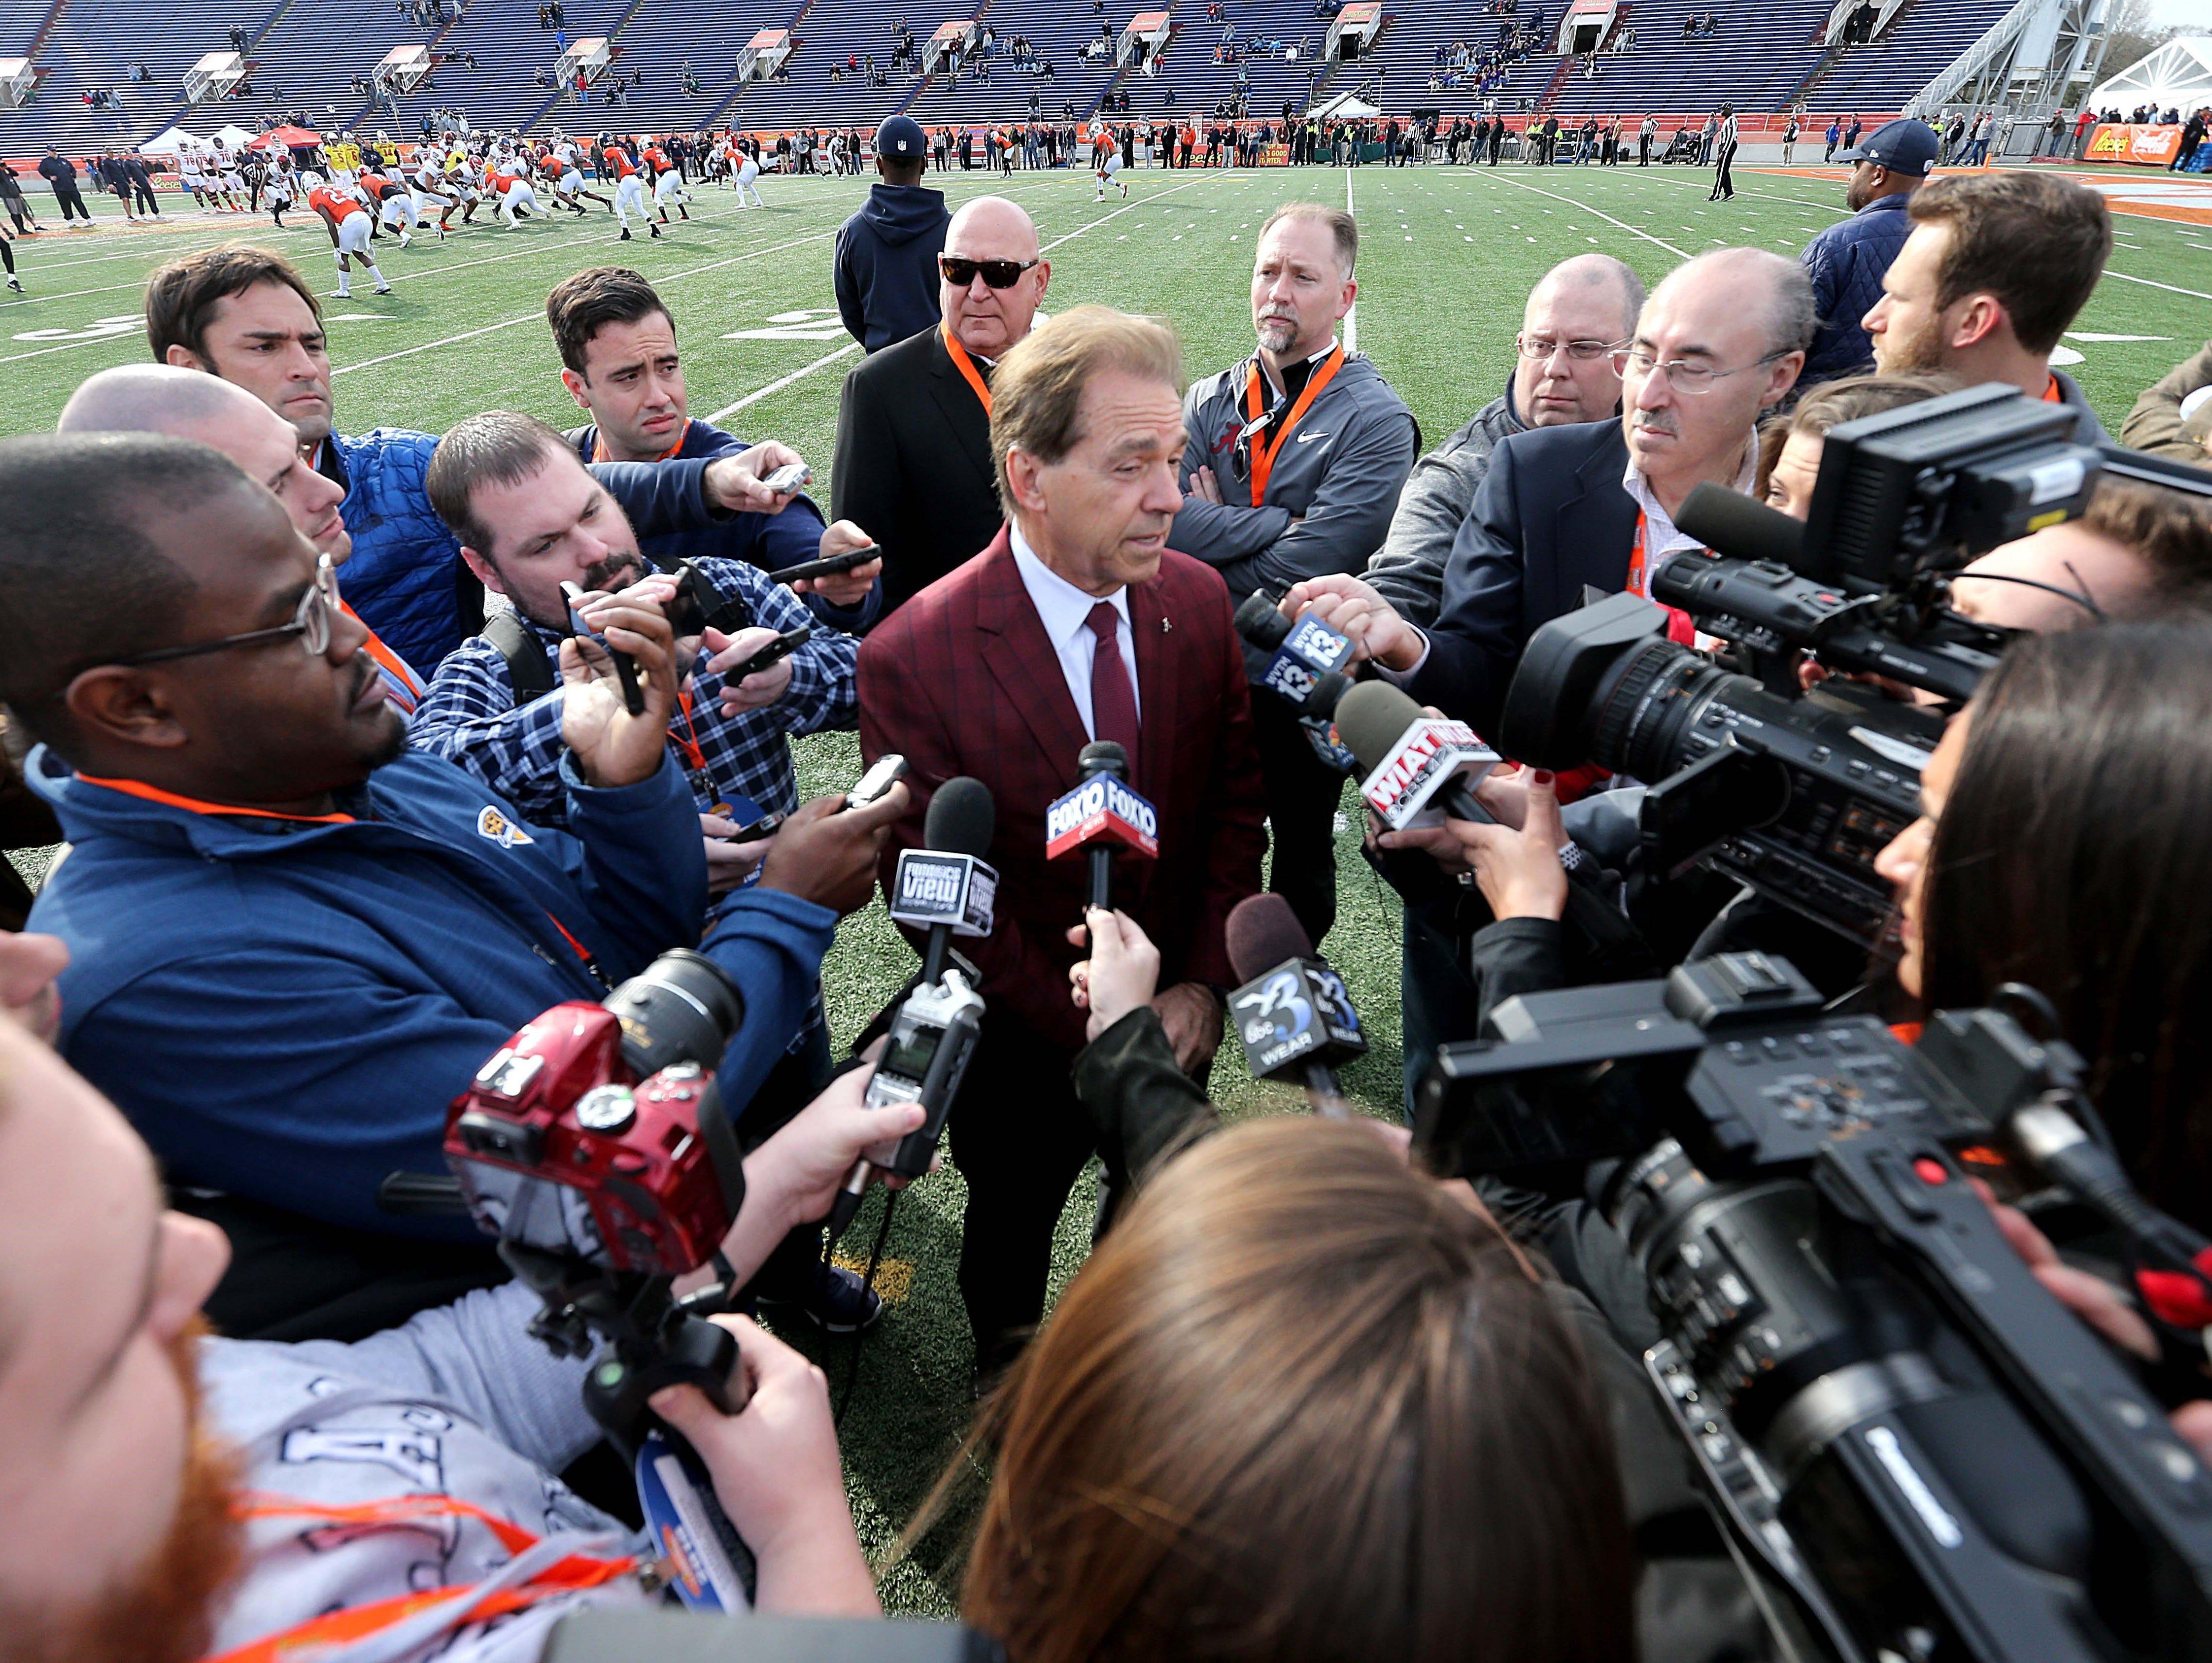 Jan 24, 2018; Mobile, AL, USA; Alabama Crimson Tide head coach Nick Saban talks to the media during Senior Bowl practice at Ladd-Peebles Stadium. Mandatory Credit: Chuck Cook-USA TODAY Sports